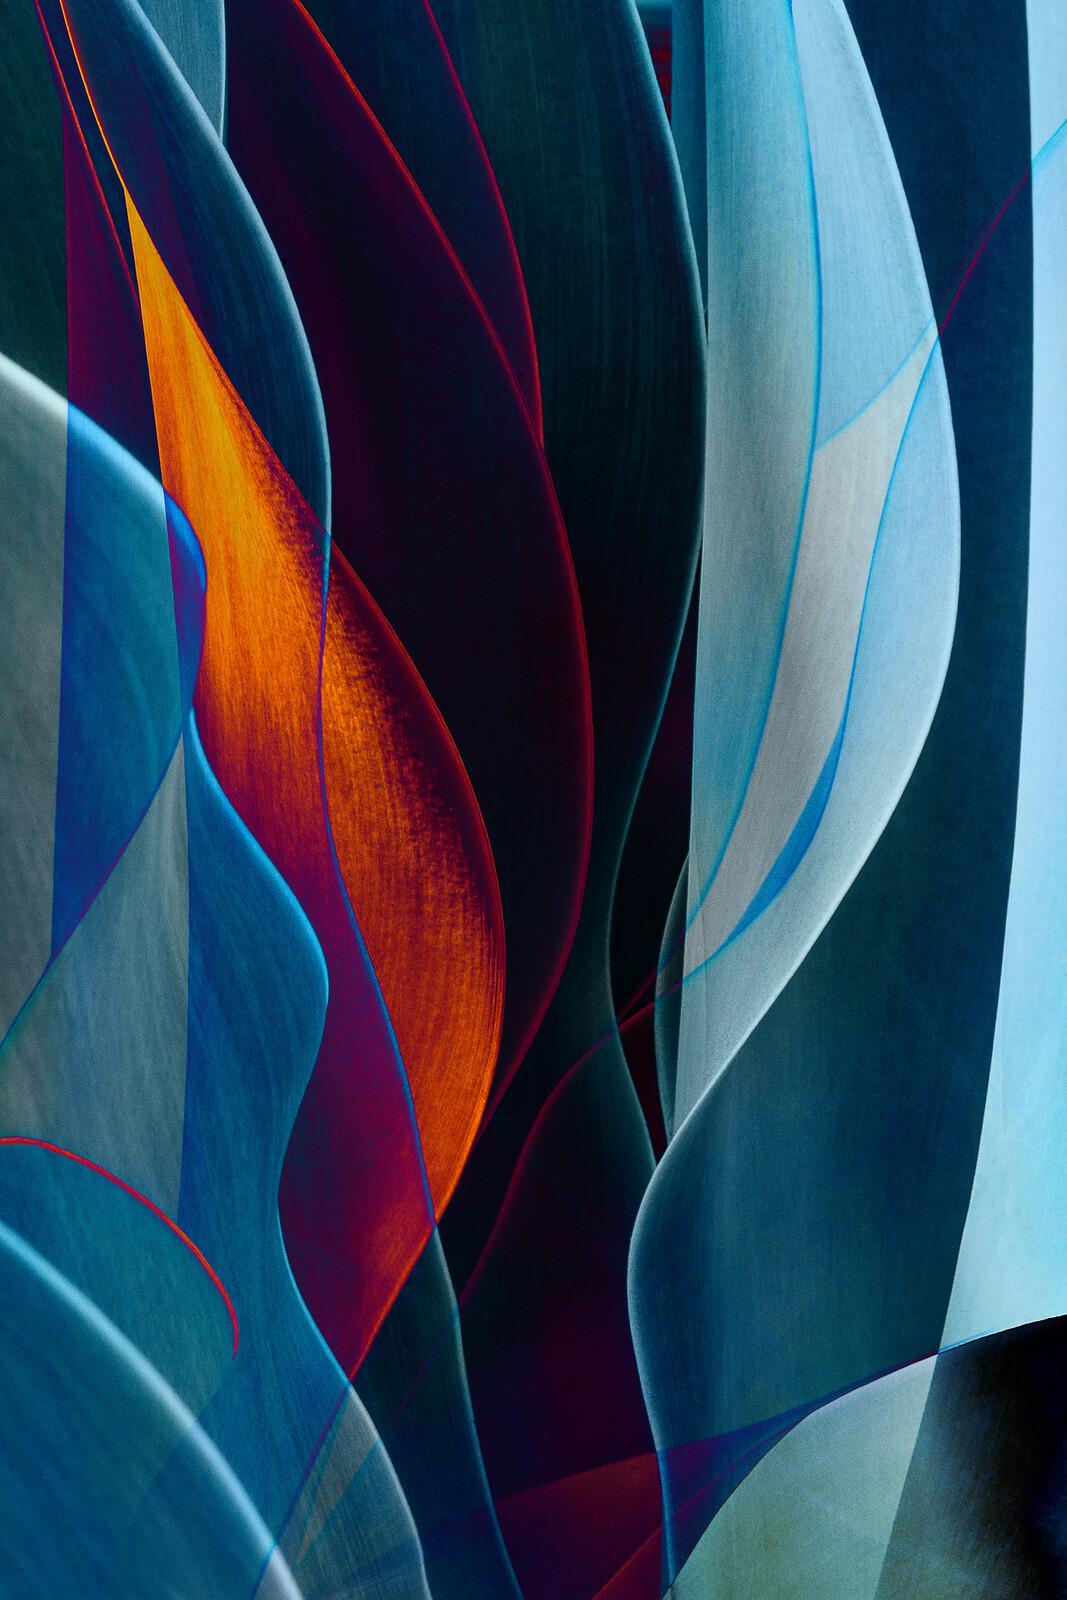 Cactus Abstraction 08 - Ed Freeman